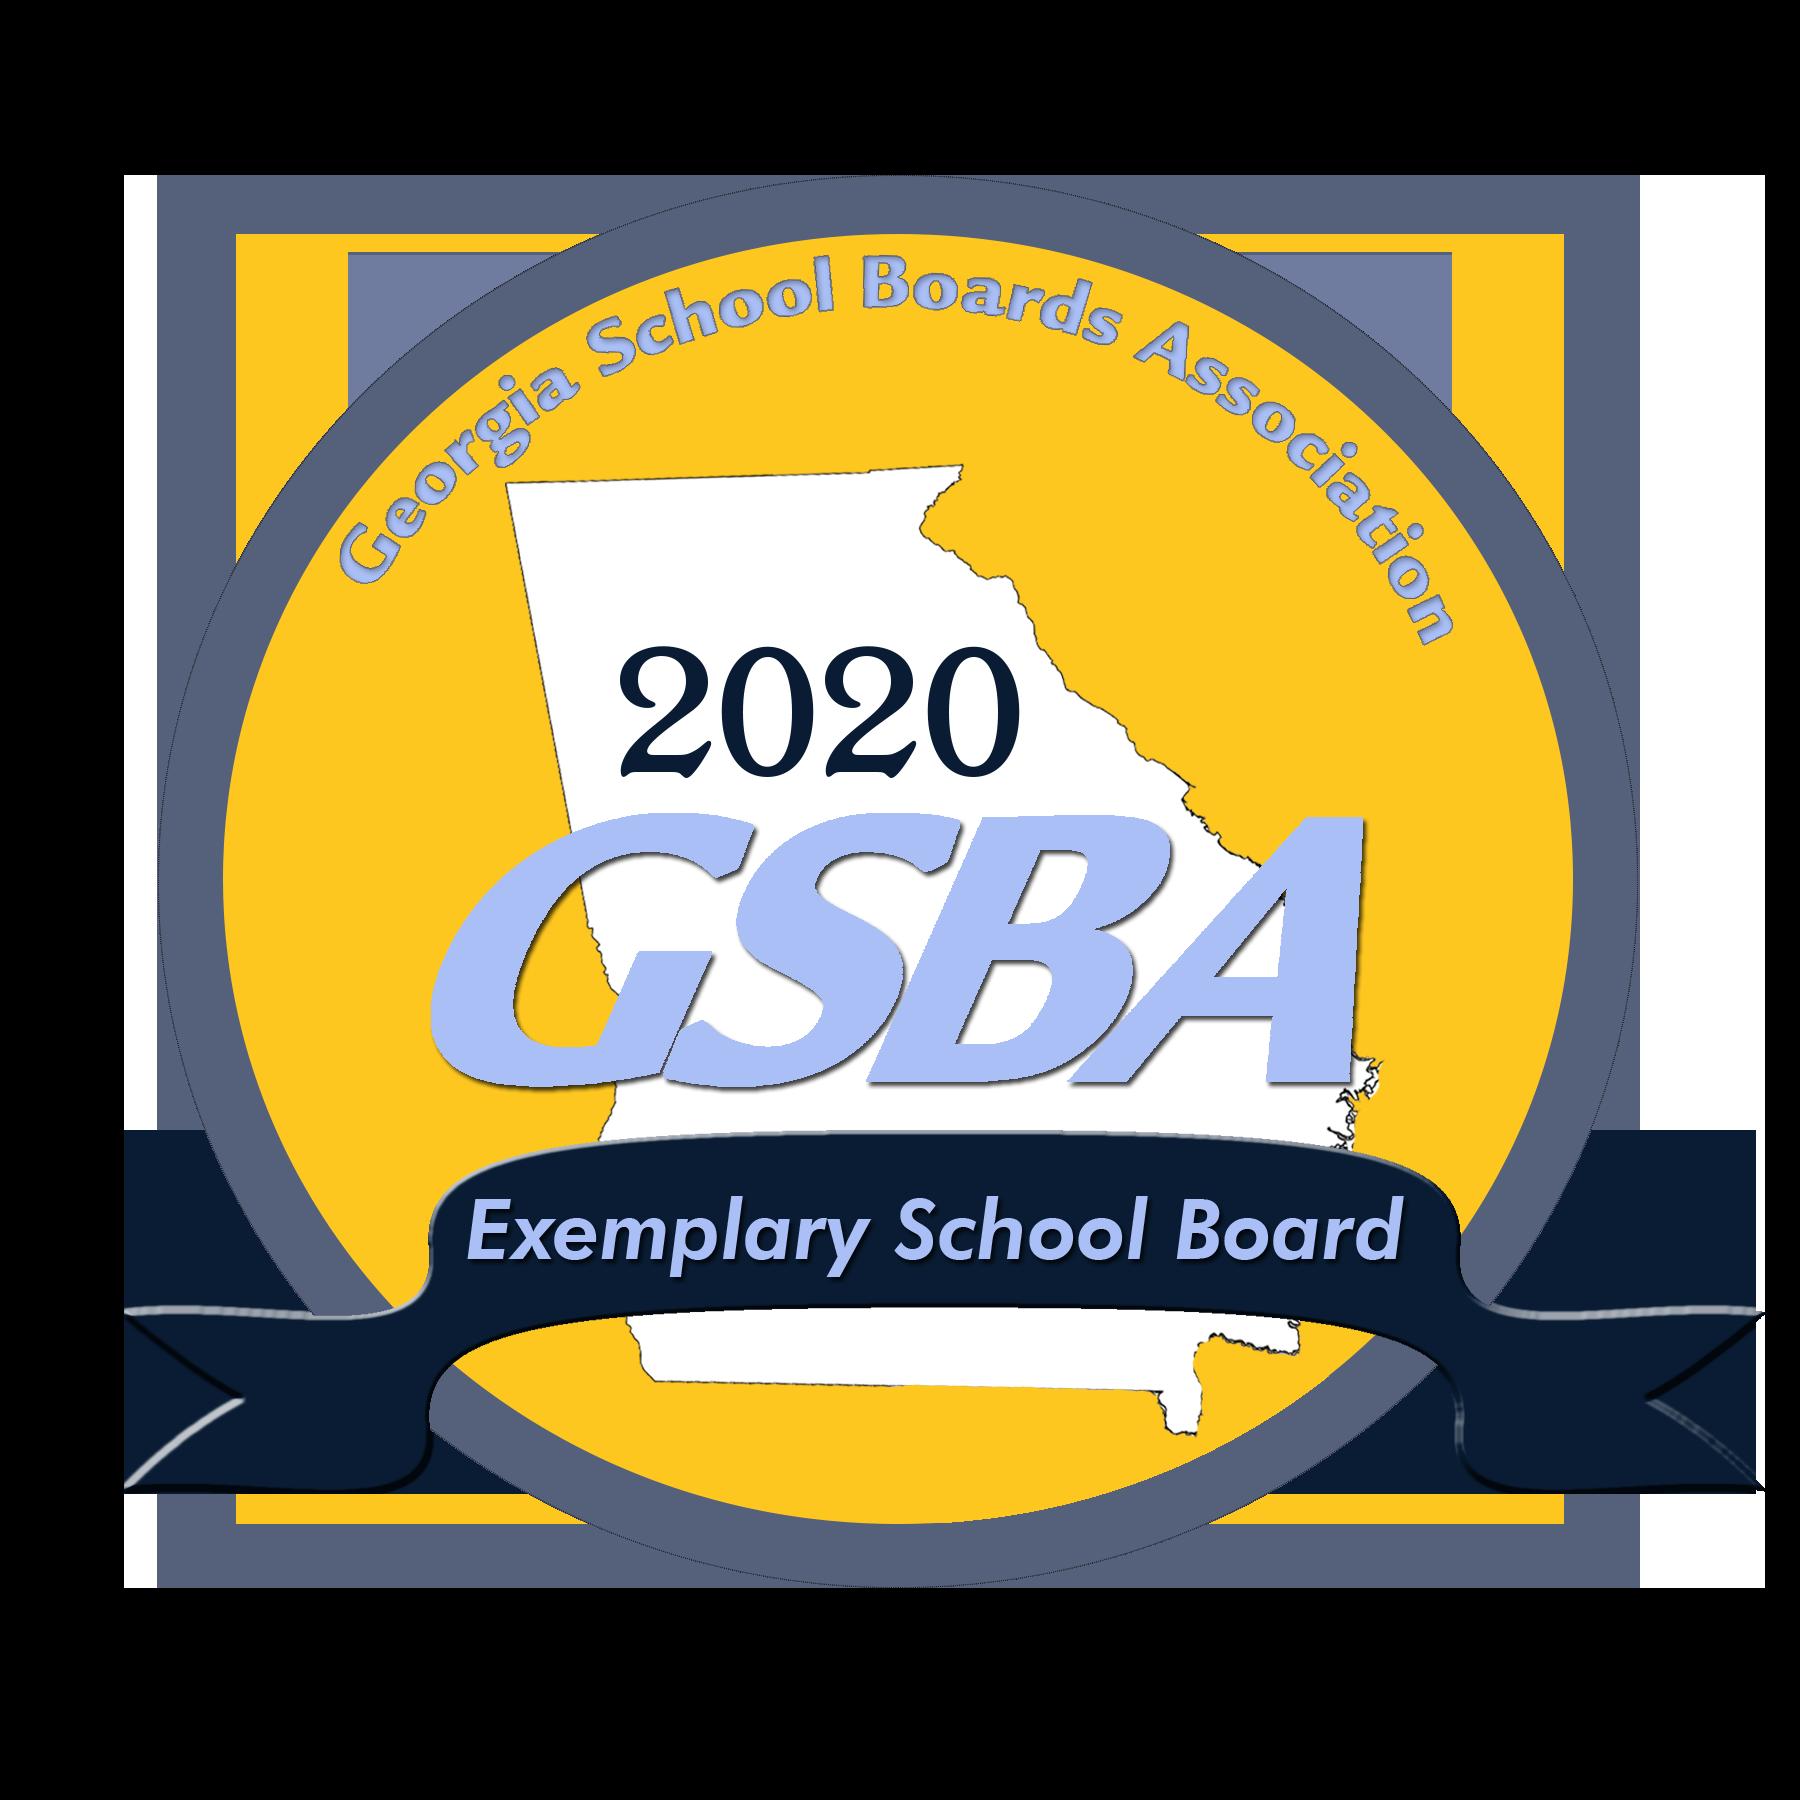 GSBA Exemplary Board 2020